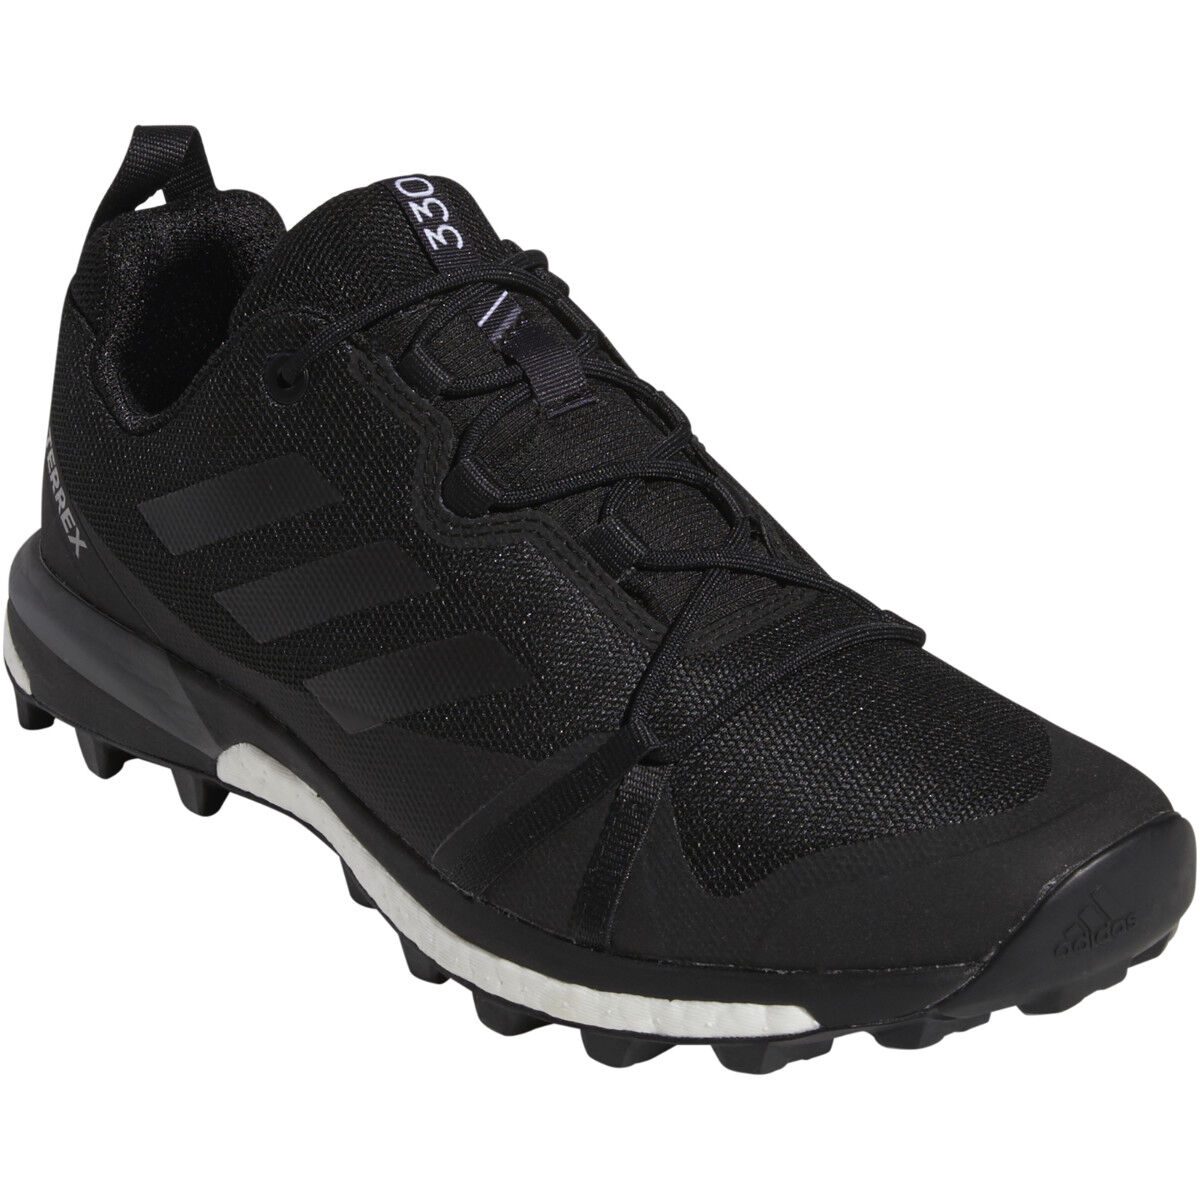 adidas TERREX Skychaser LT Low Cut Schuhe Herren core blackcore blackgrey four